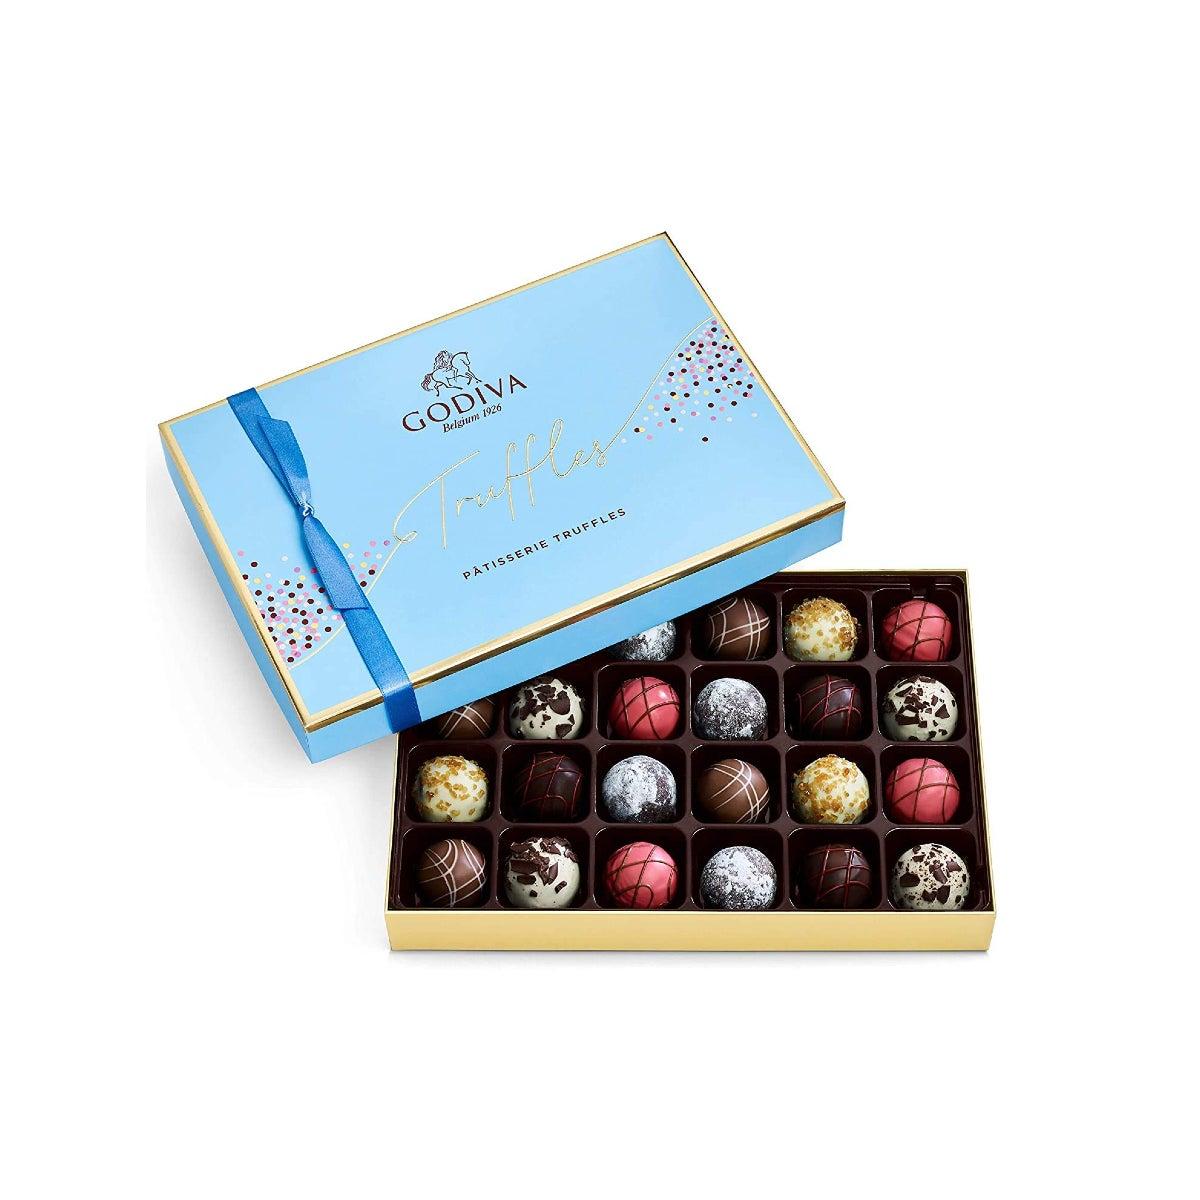 Best Chocolate Gifts Option Godiva Chocolatier Patisserie Dessert Truffles Assorted Chocolate Gift Box